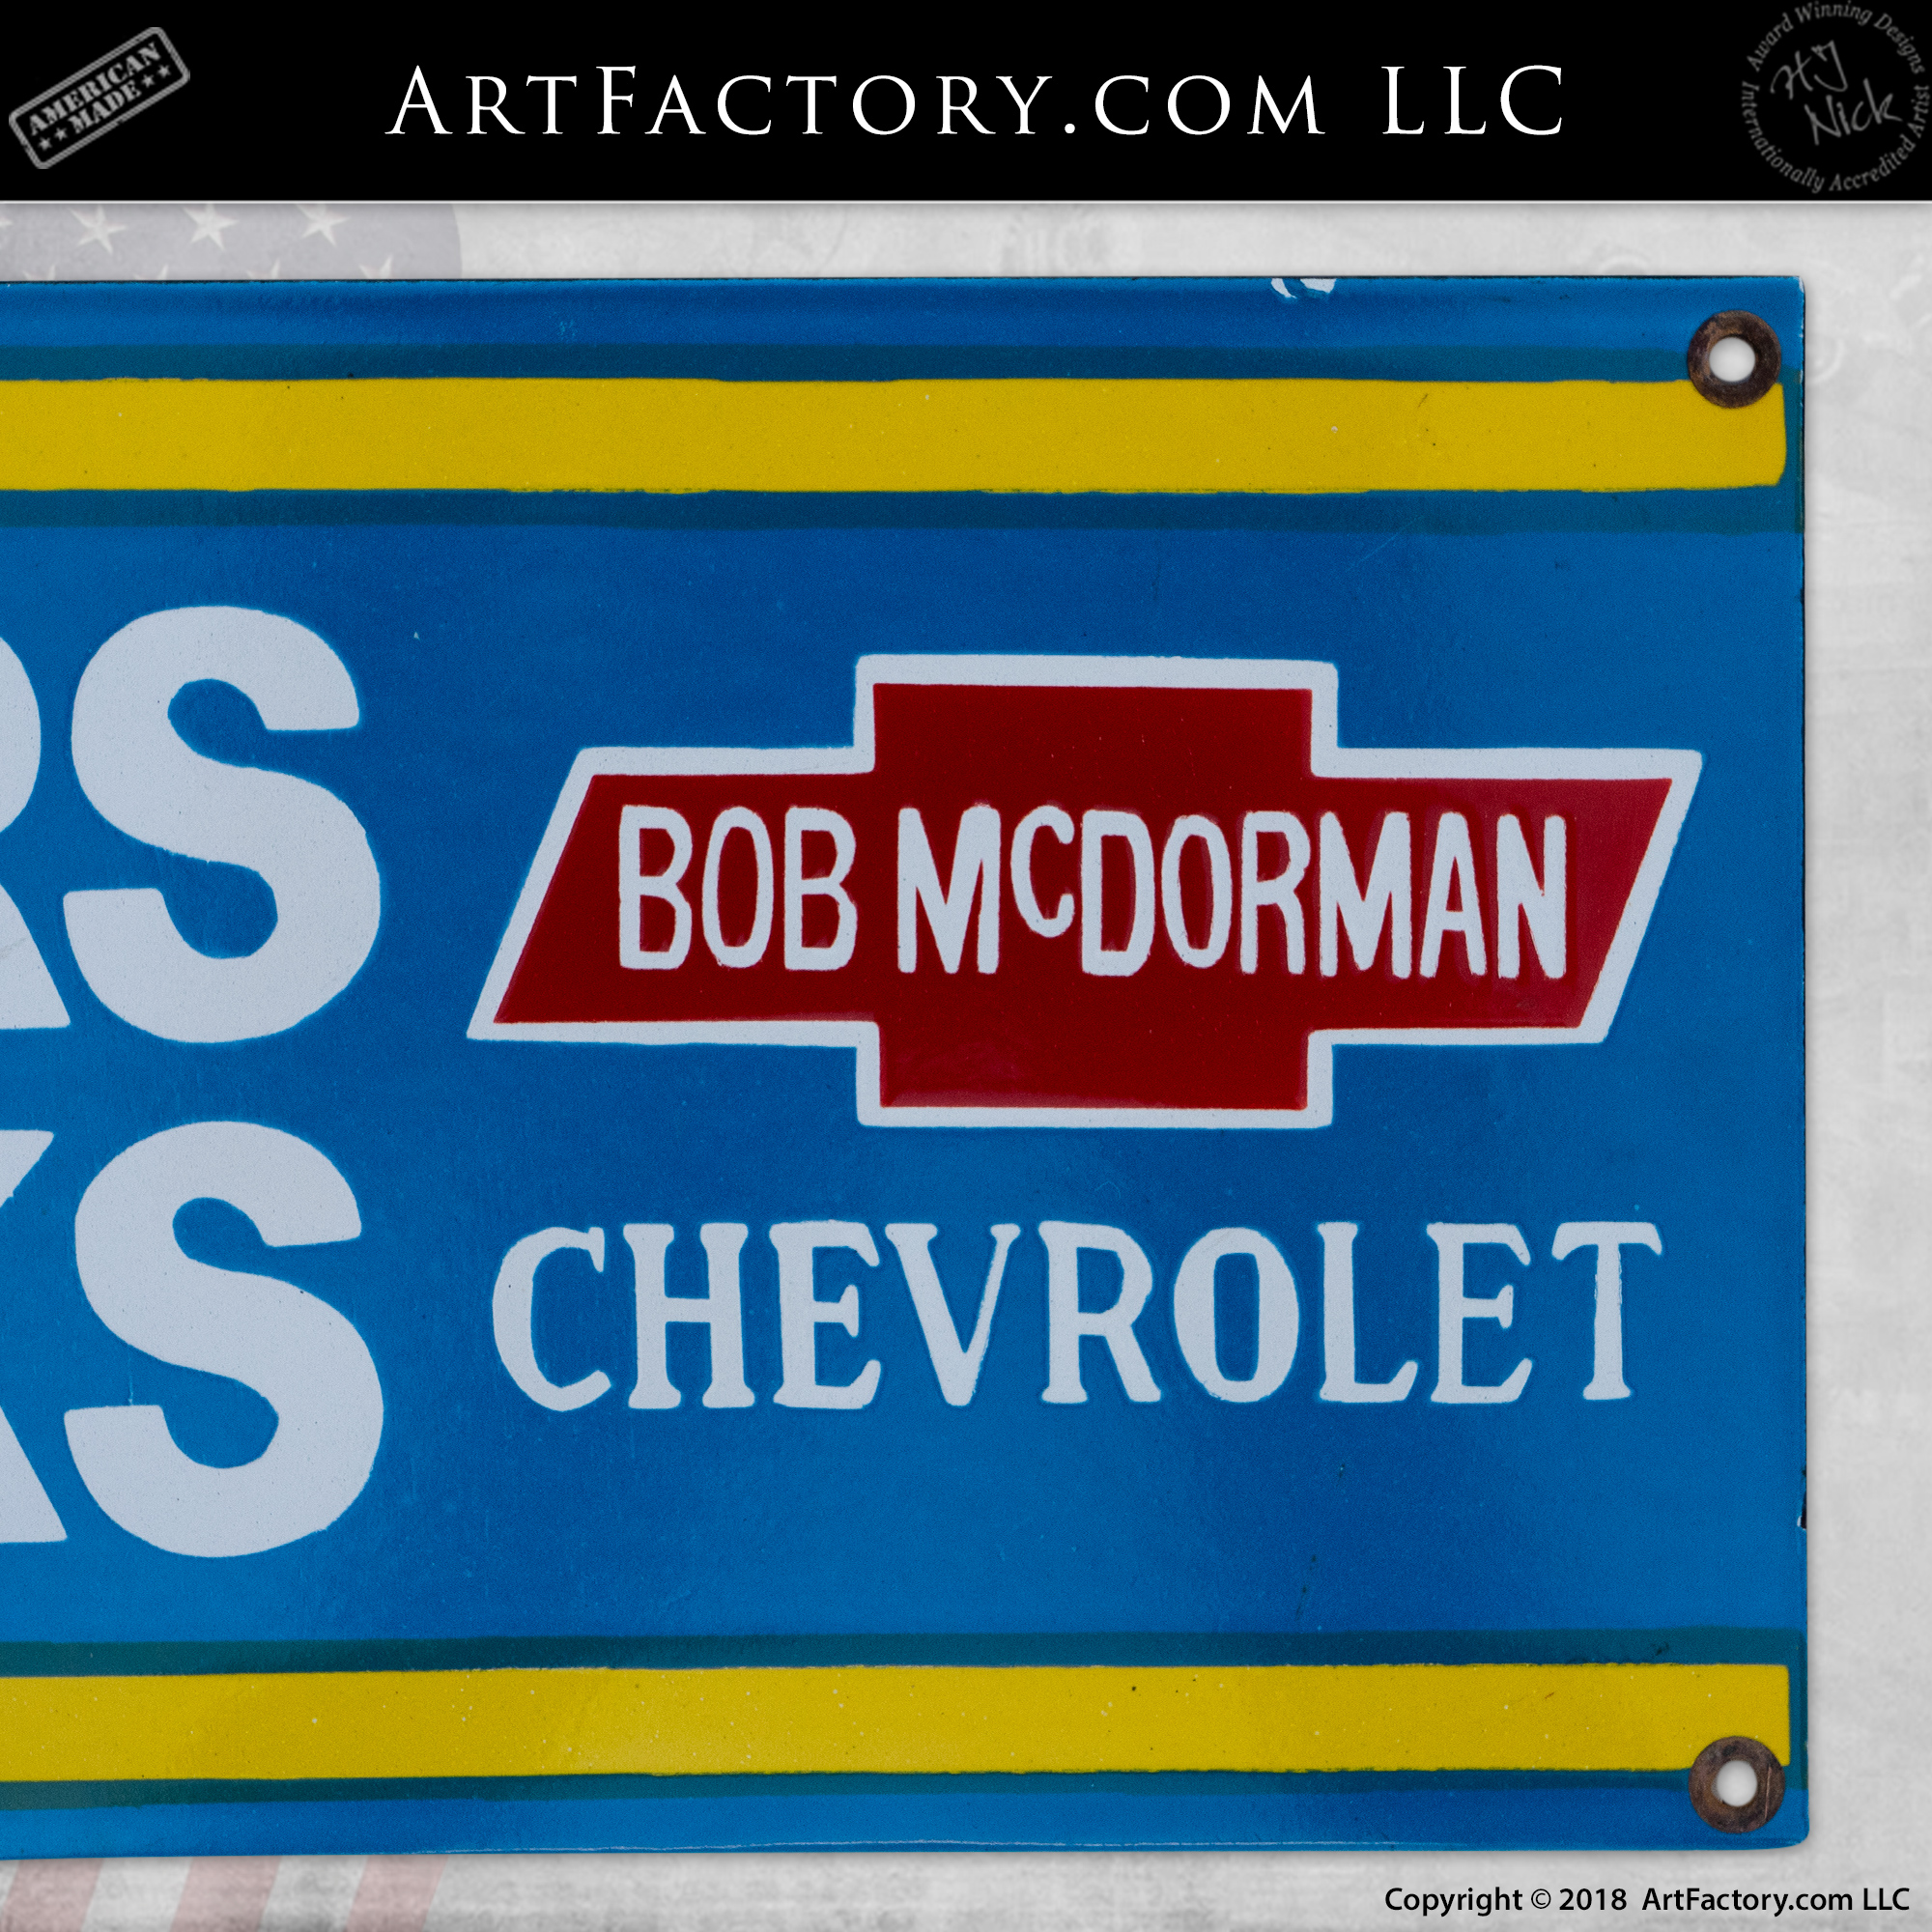 Vintage OK Used Car & Truck Chevrolet Sign